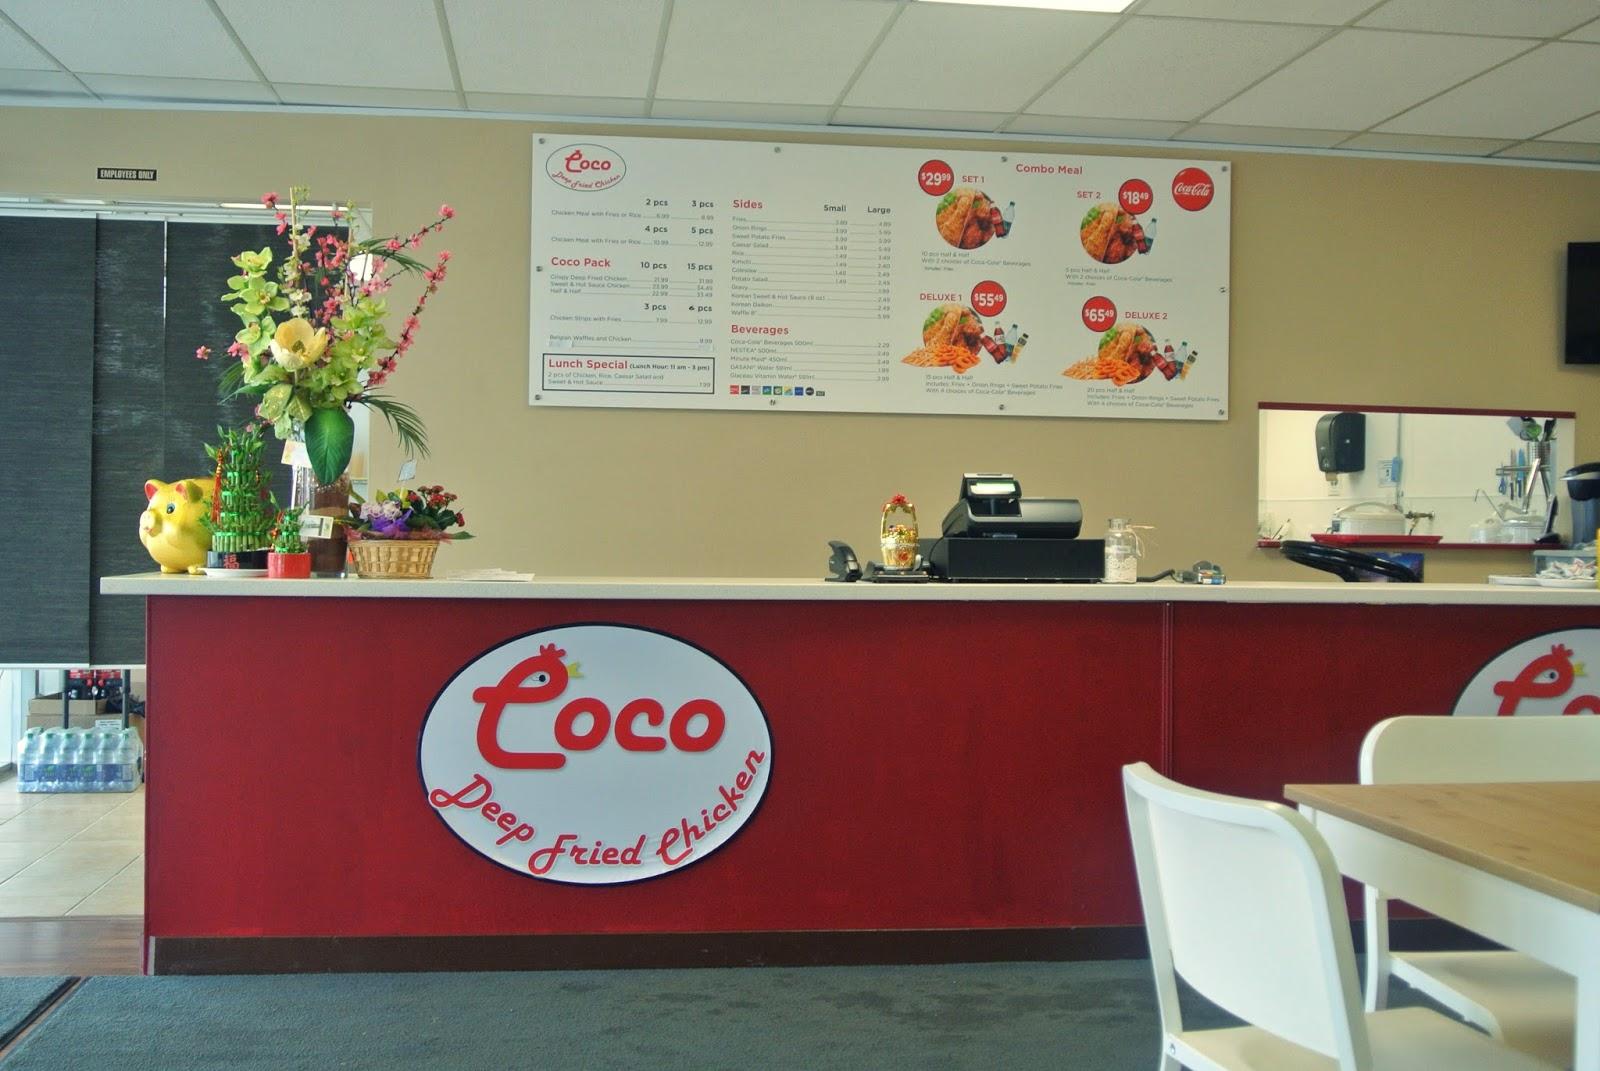 Home Design Furniture Seremban Korean Salon Edmonton Review Coco S Deep Fried Chicken Nw